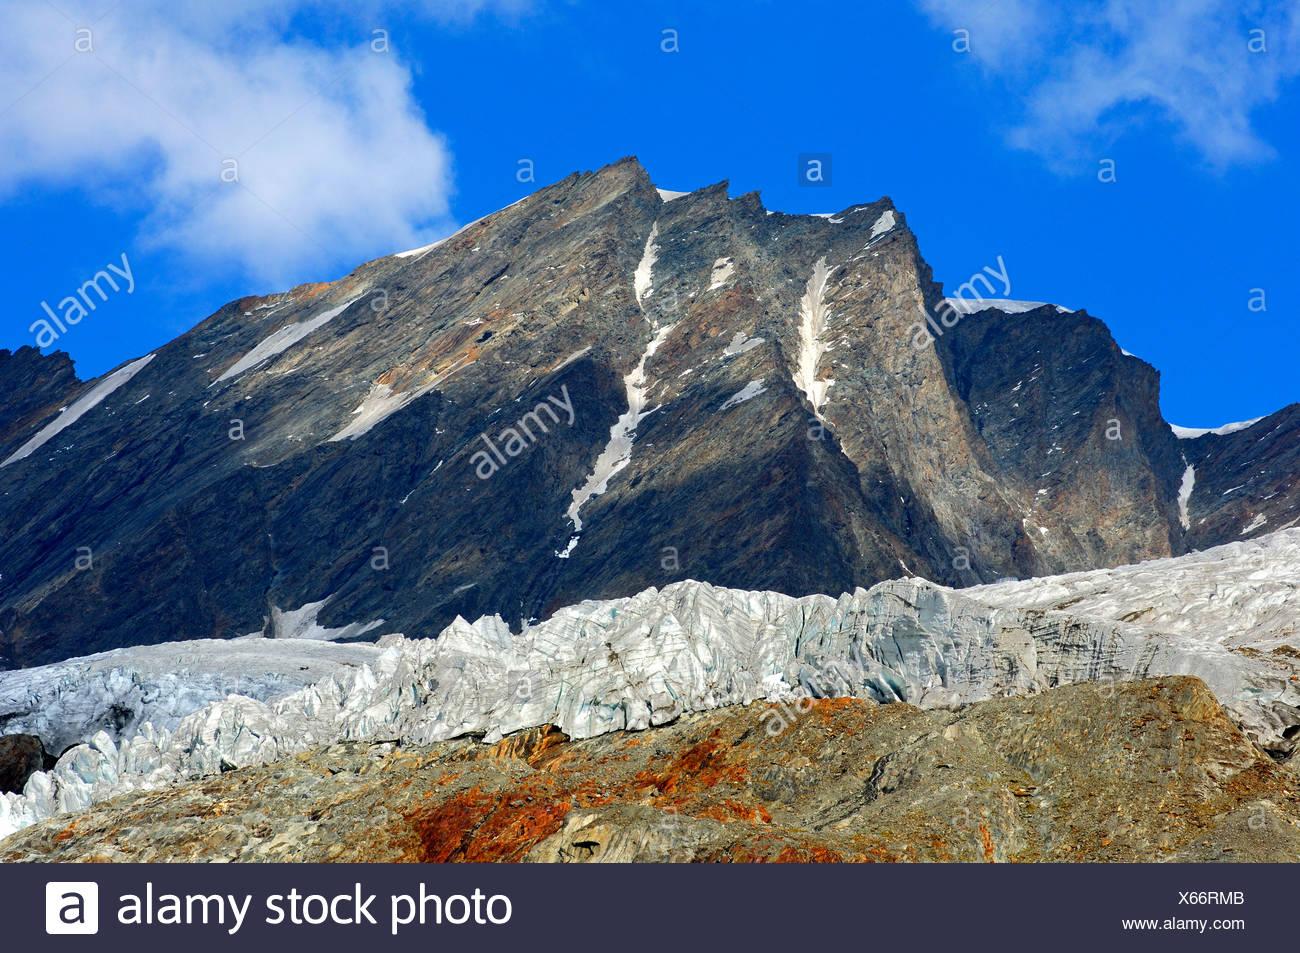 Ice front of the Anen Glacier, Loetschental Valley, Valais, Switzerland, Europe - Stock Image